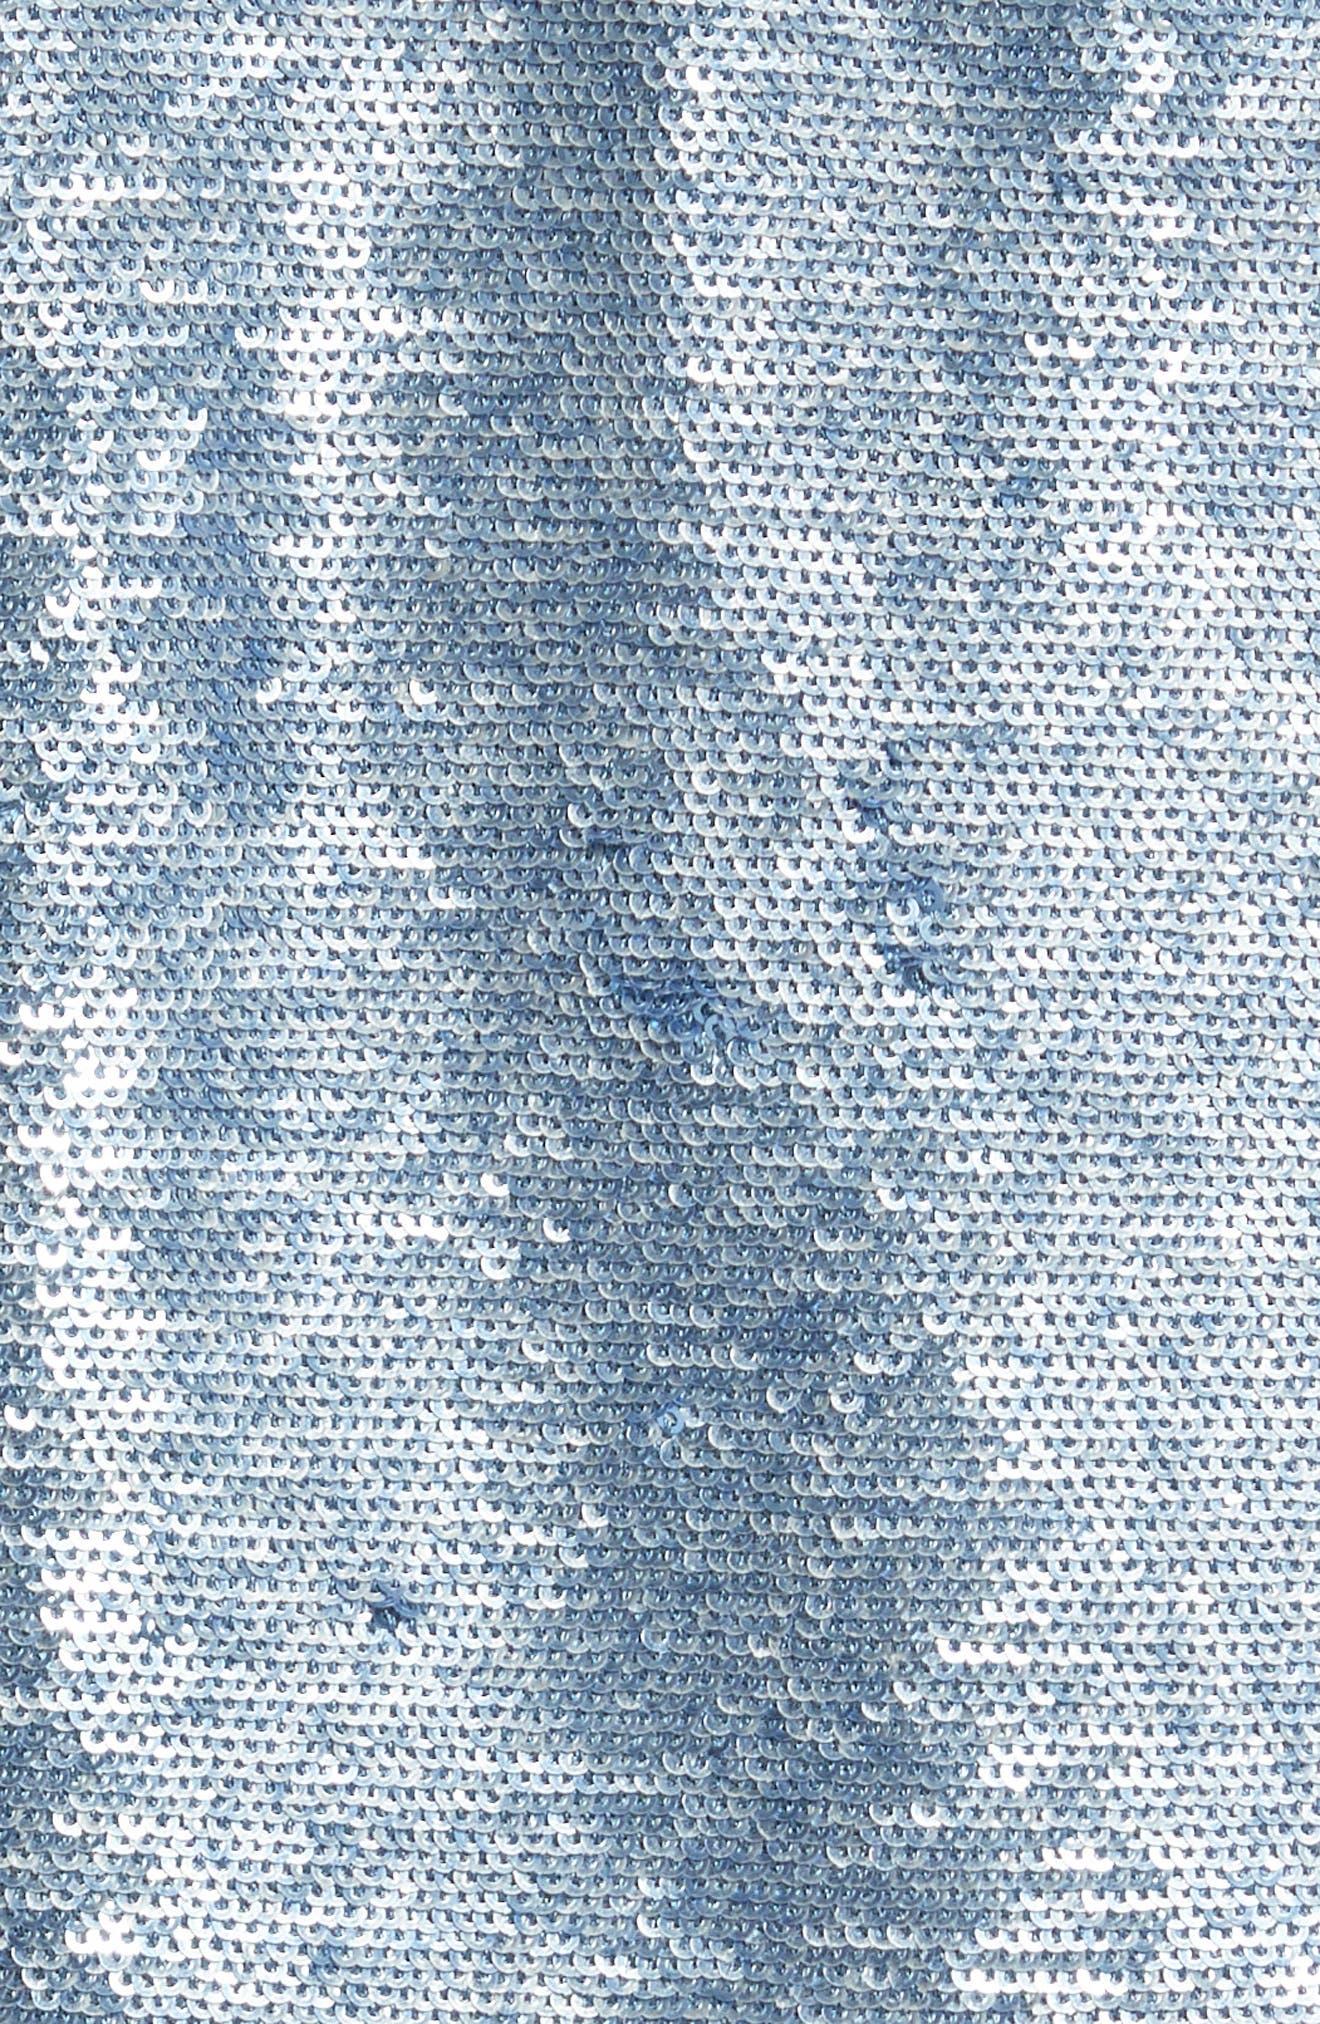 Dalome Sequin Jacket,                             Alternate thumbnail 6, color,                             454